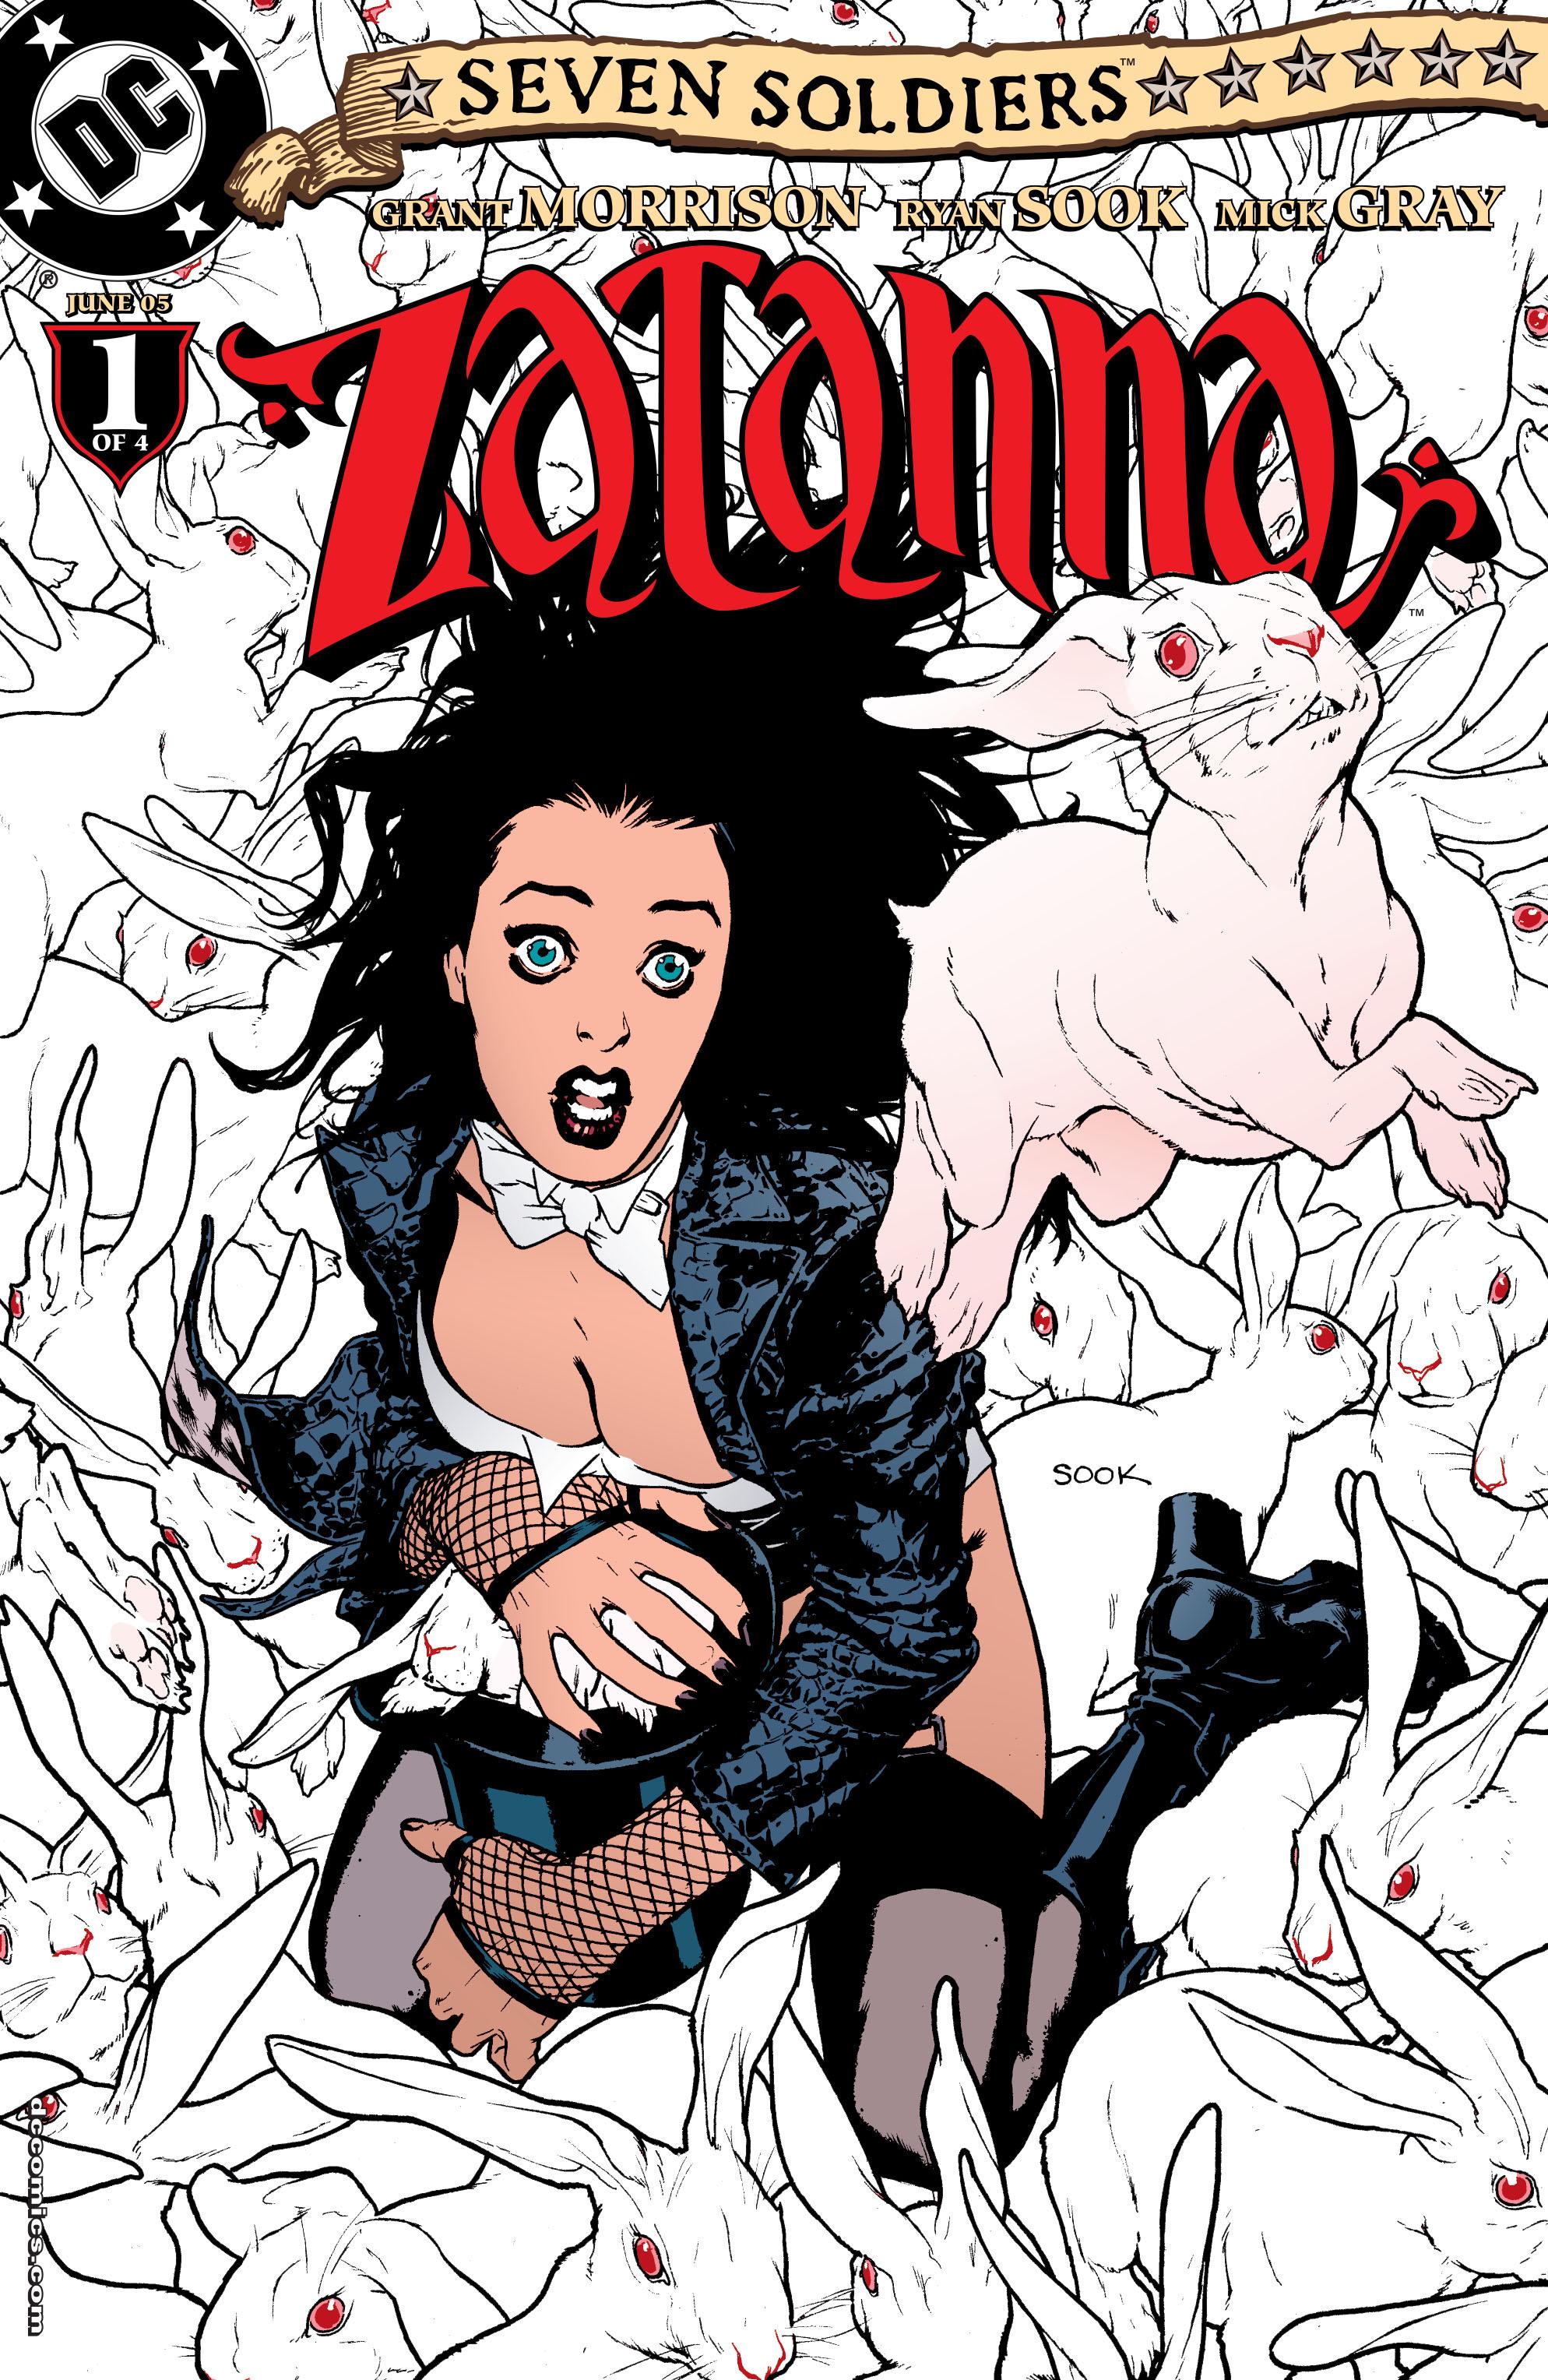 Read online Seven Soldiers: Zatanna comic -  Issue #1 - 1